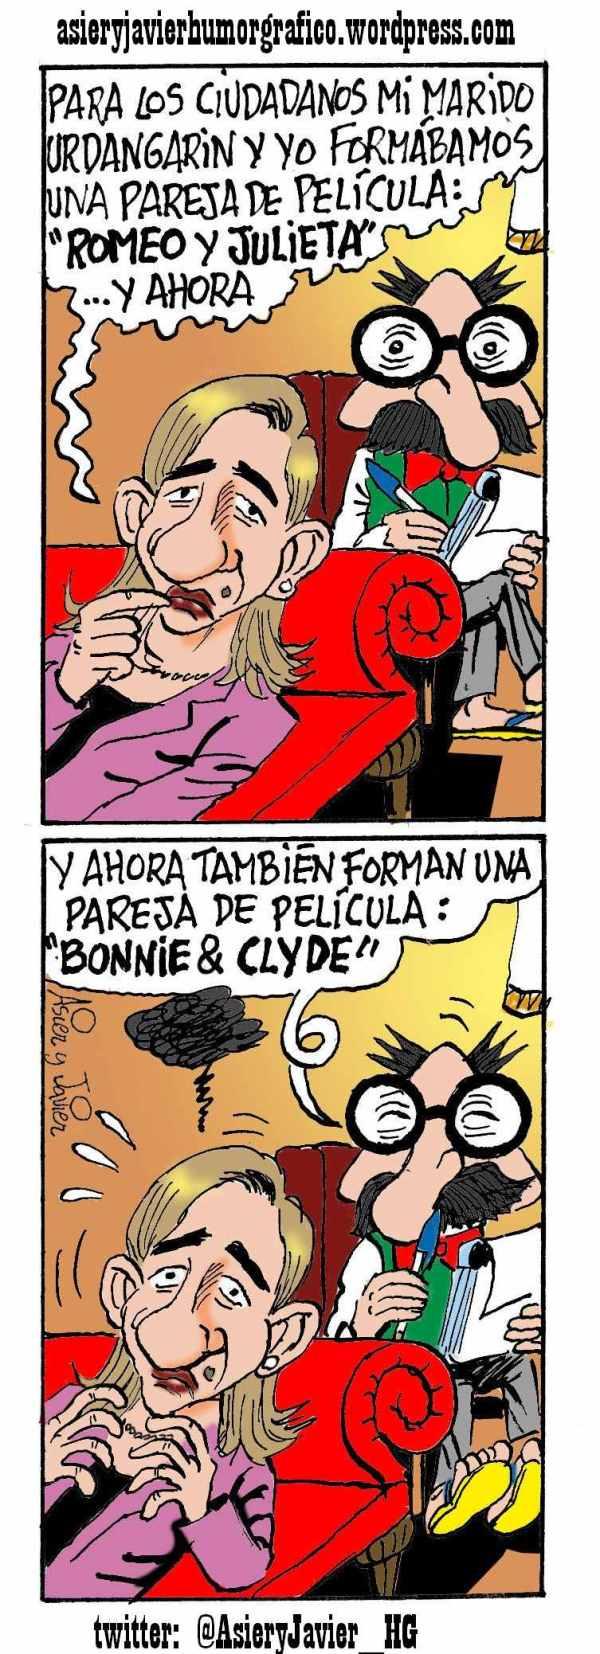 La infanta Cristina de Borbón acude al doctor Txok